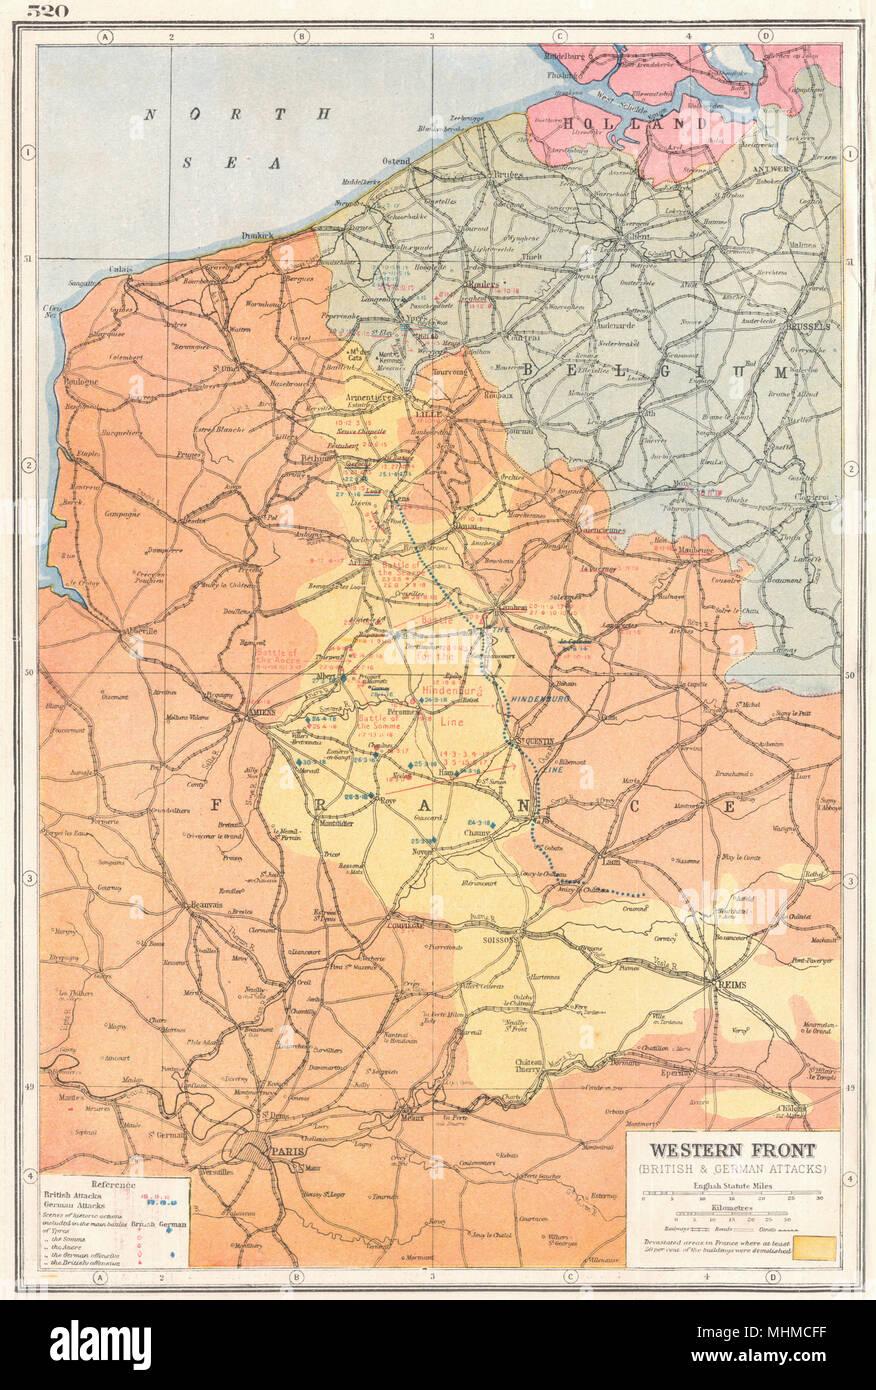 Map Of France Ww1.France Belgium Western Front First World War 1 Key Battles 1914 18